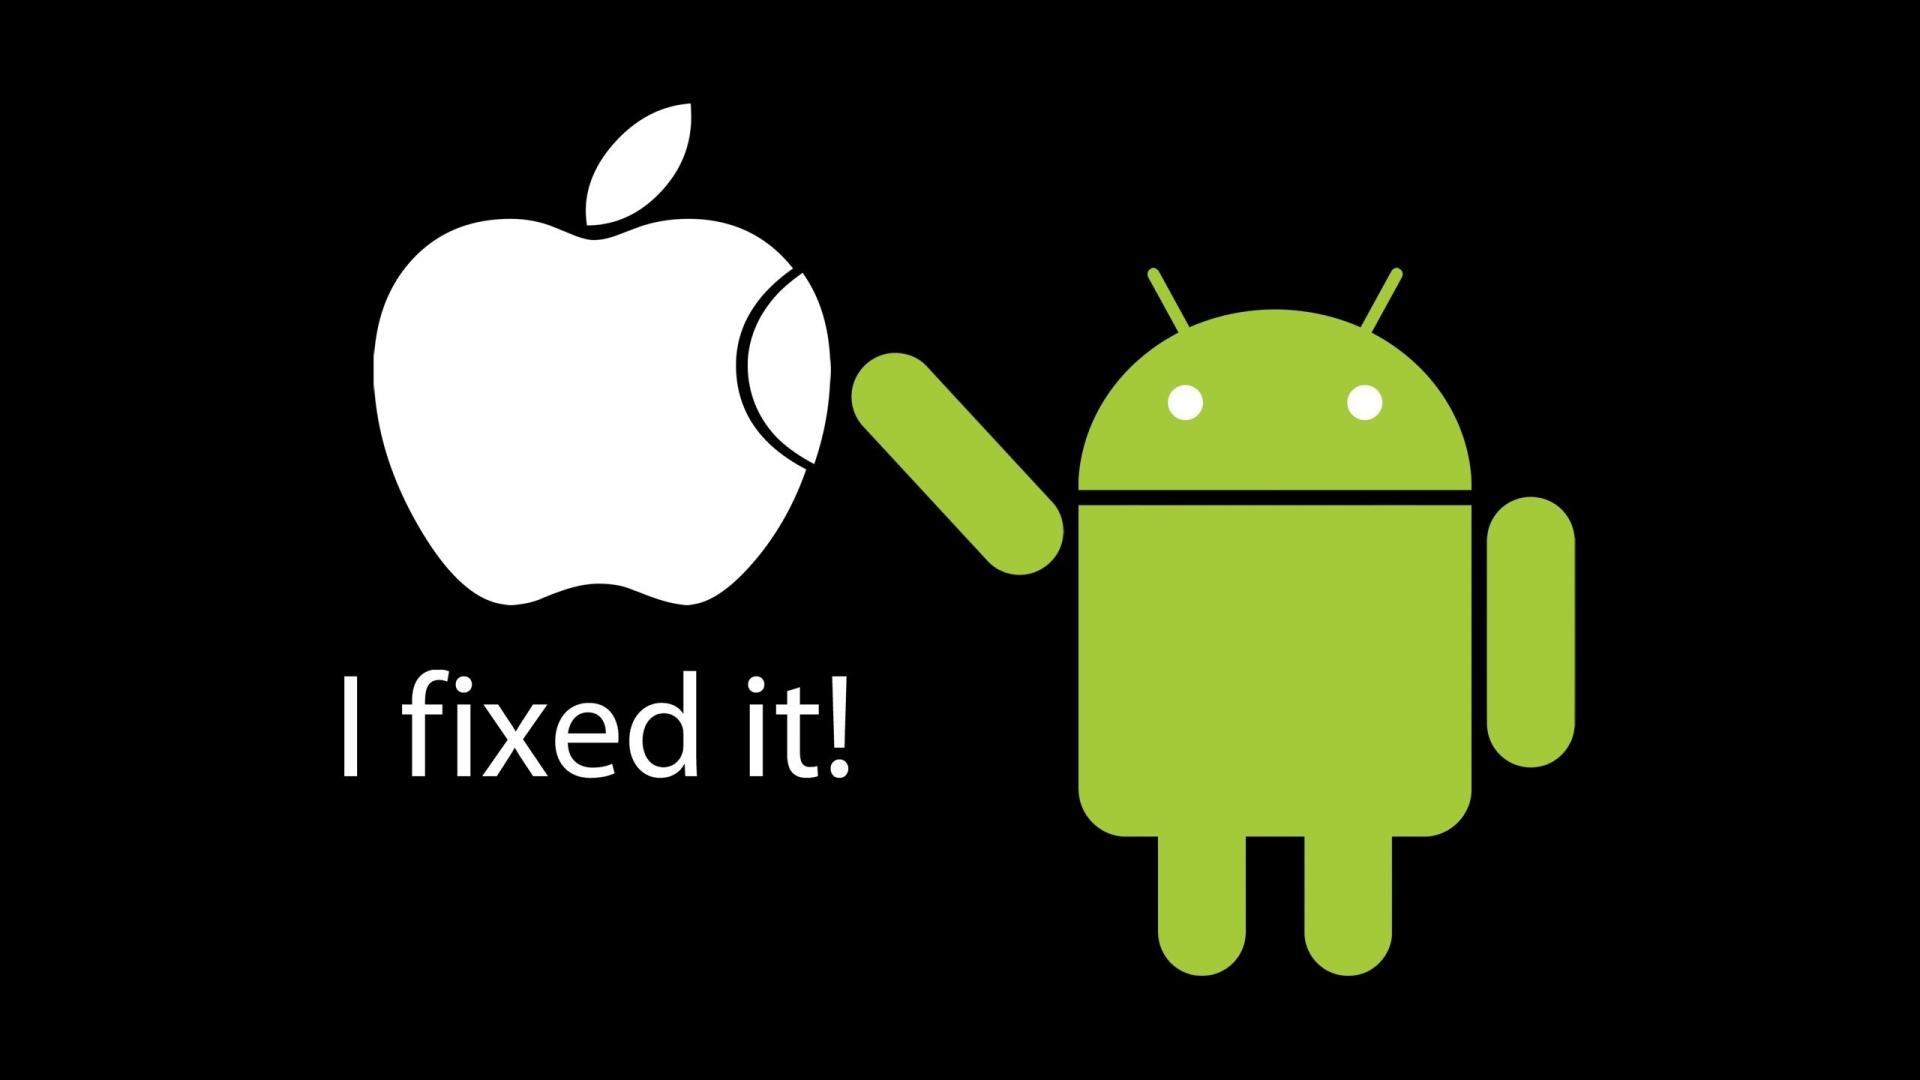 Android Fix It Wallpaper